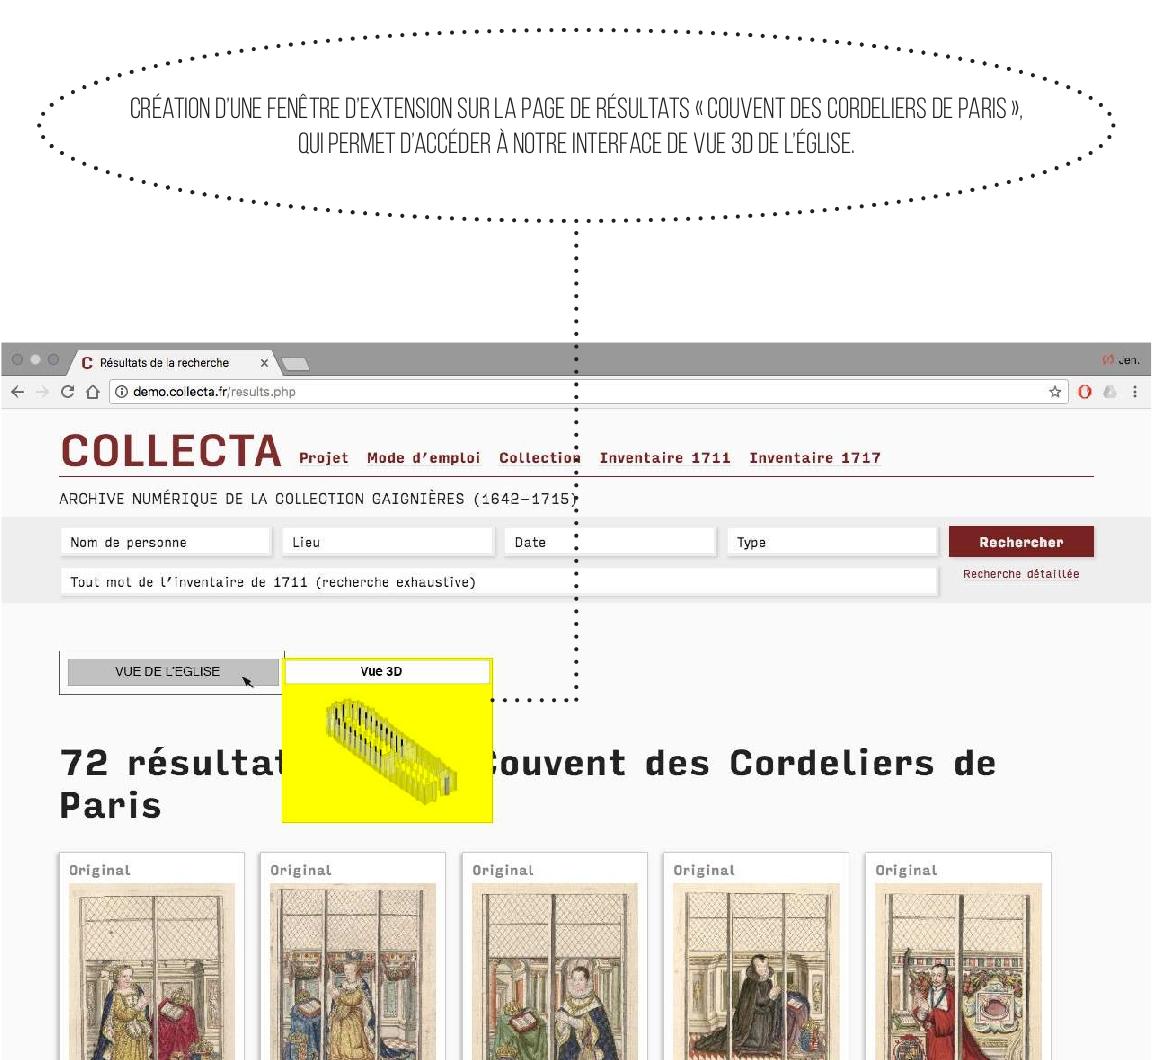 GAIGNIERES_Jennifer Pouillaude_Fabien Adele 2.compressed